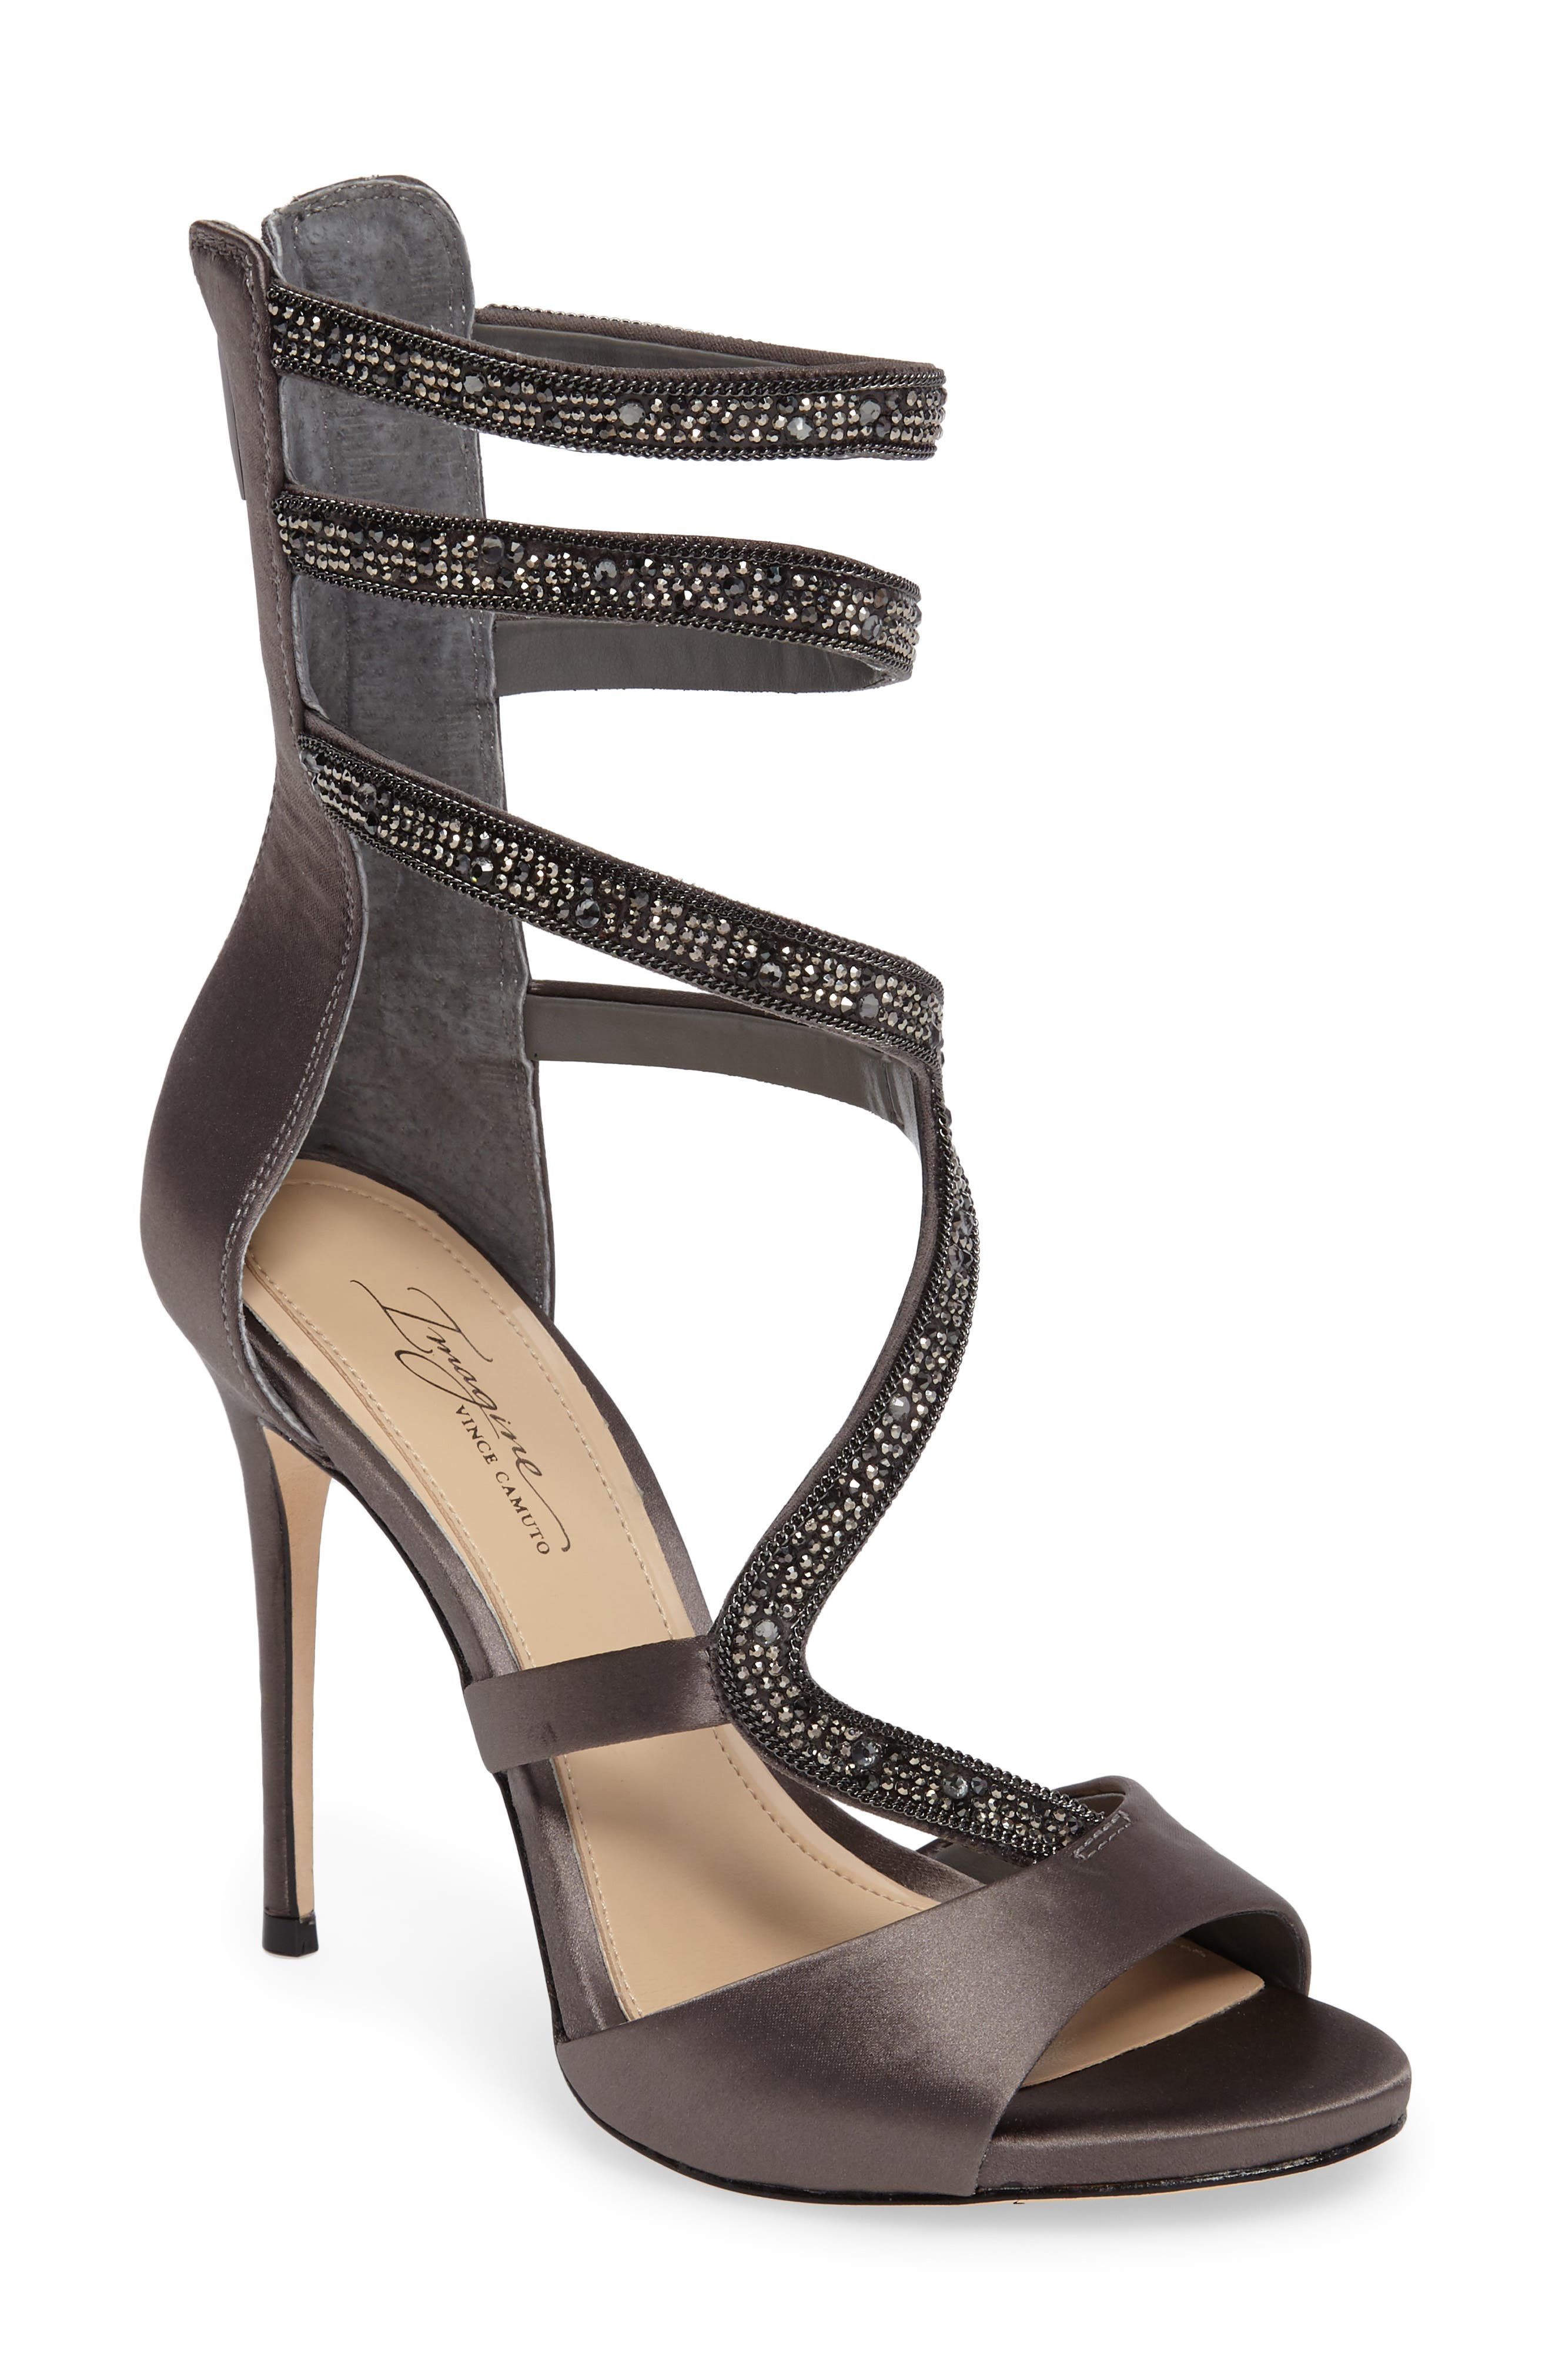 Main Image - Imagine Vince Camuto Dafny Embellished Sandal (Women)